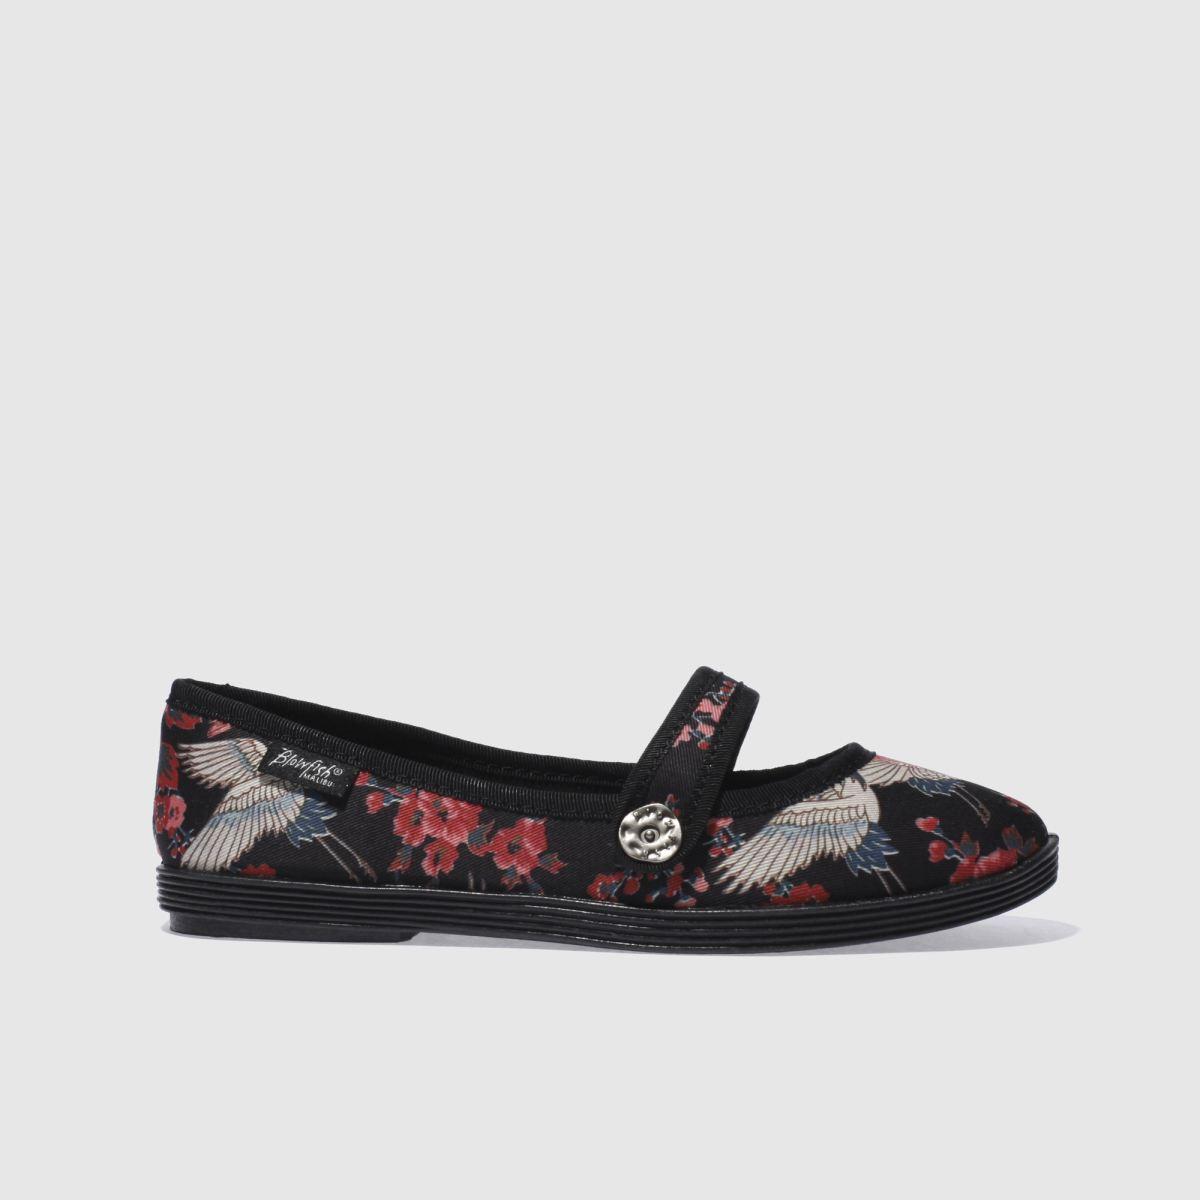 blowfish black & red goji haiku flat shoes